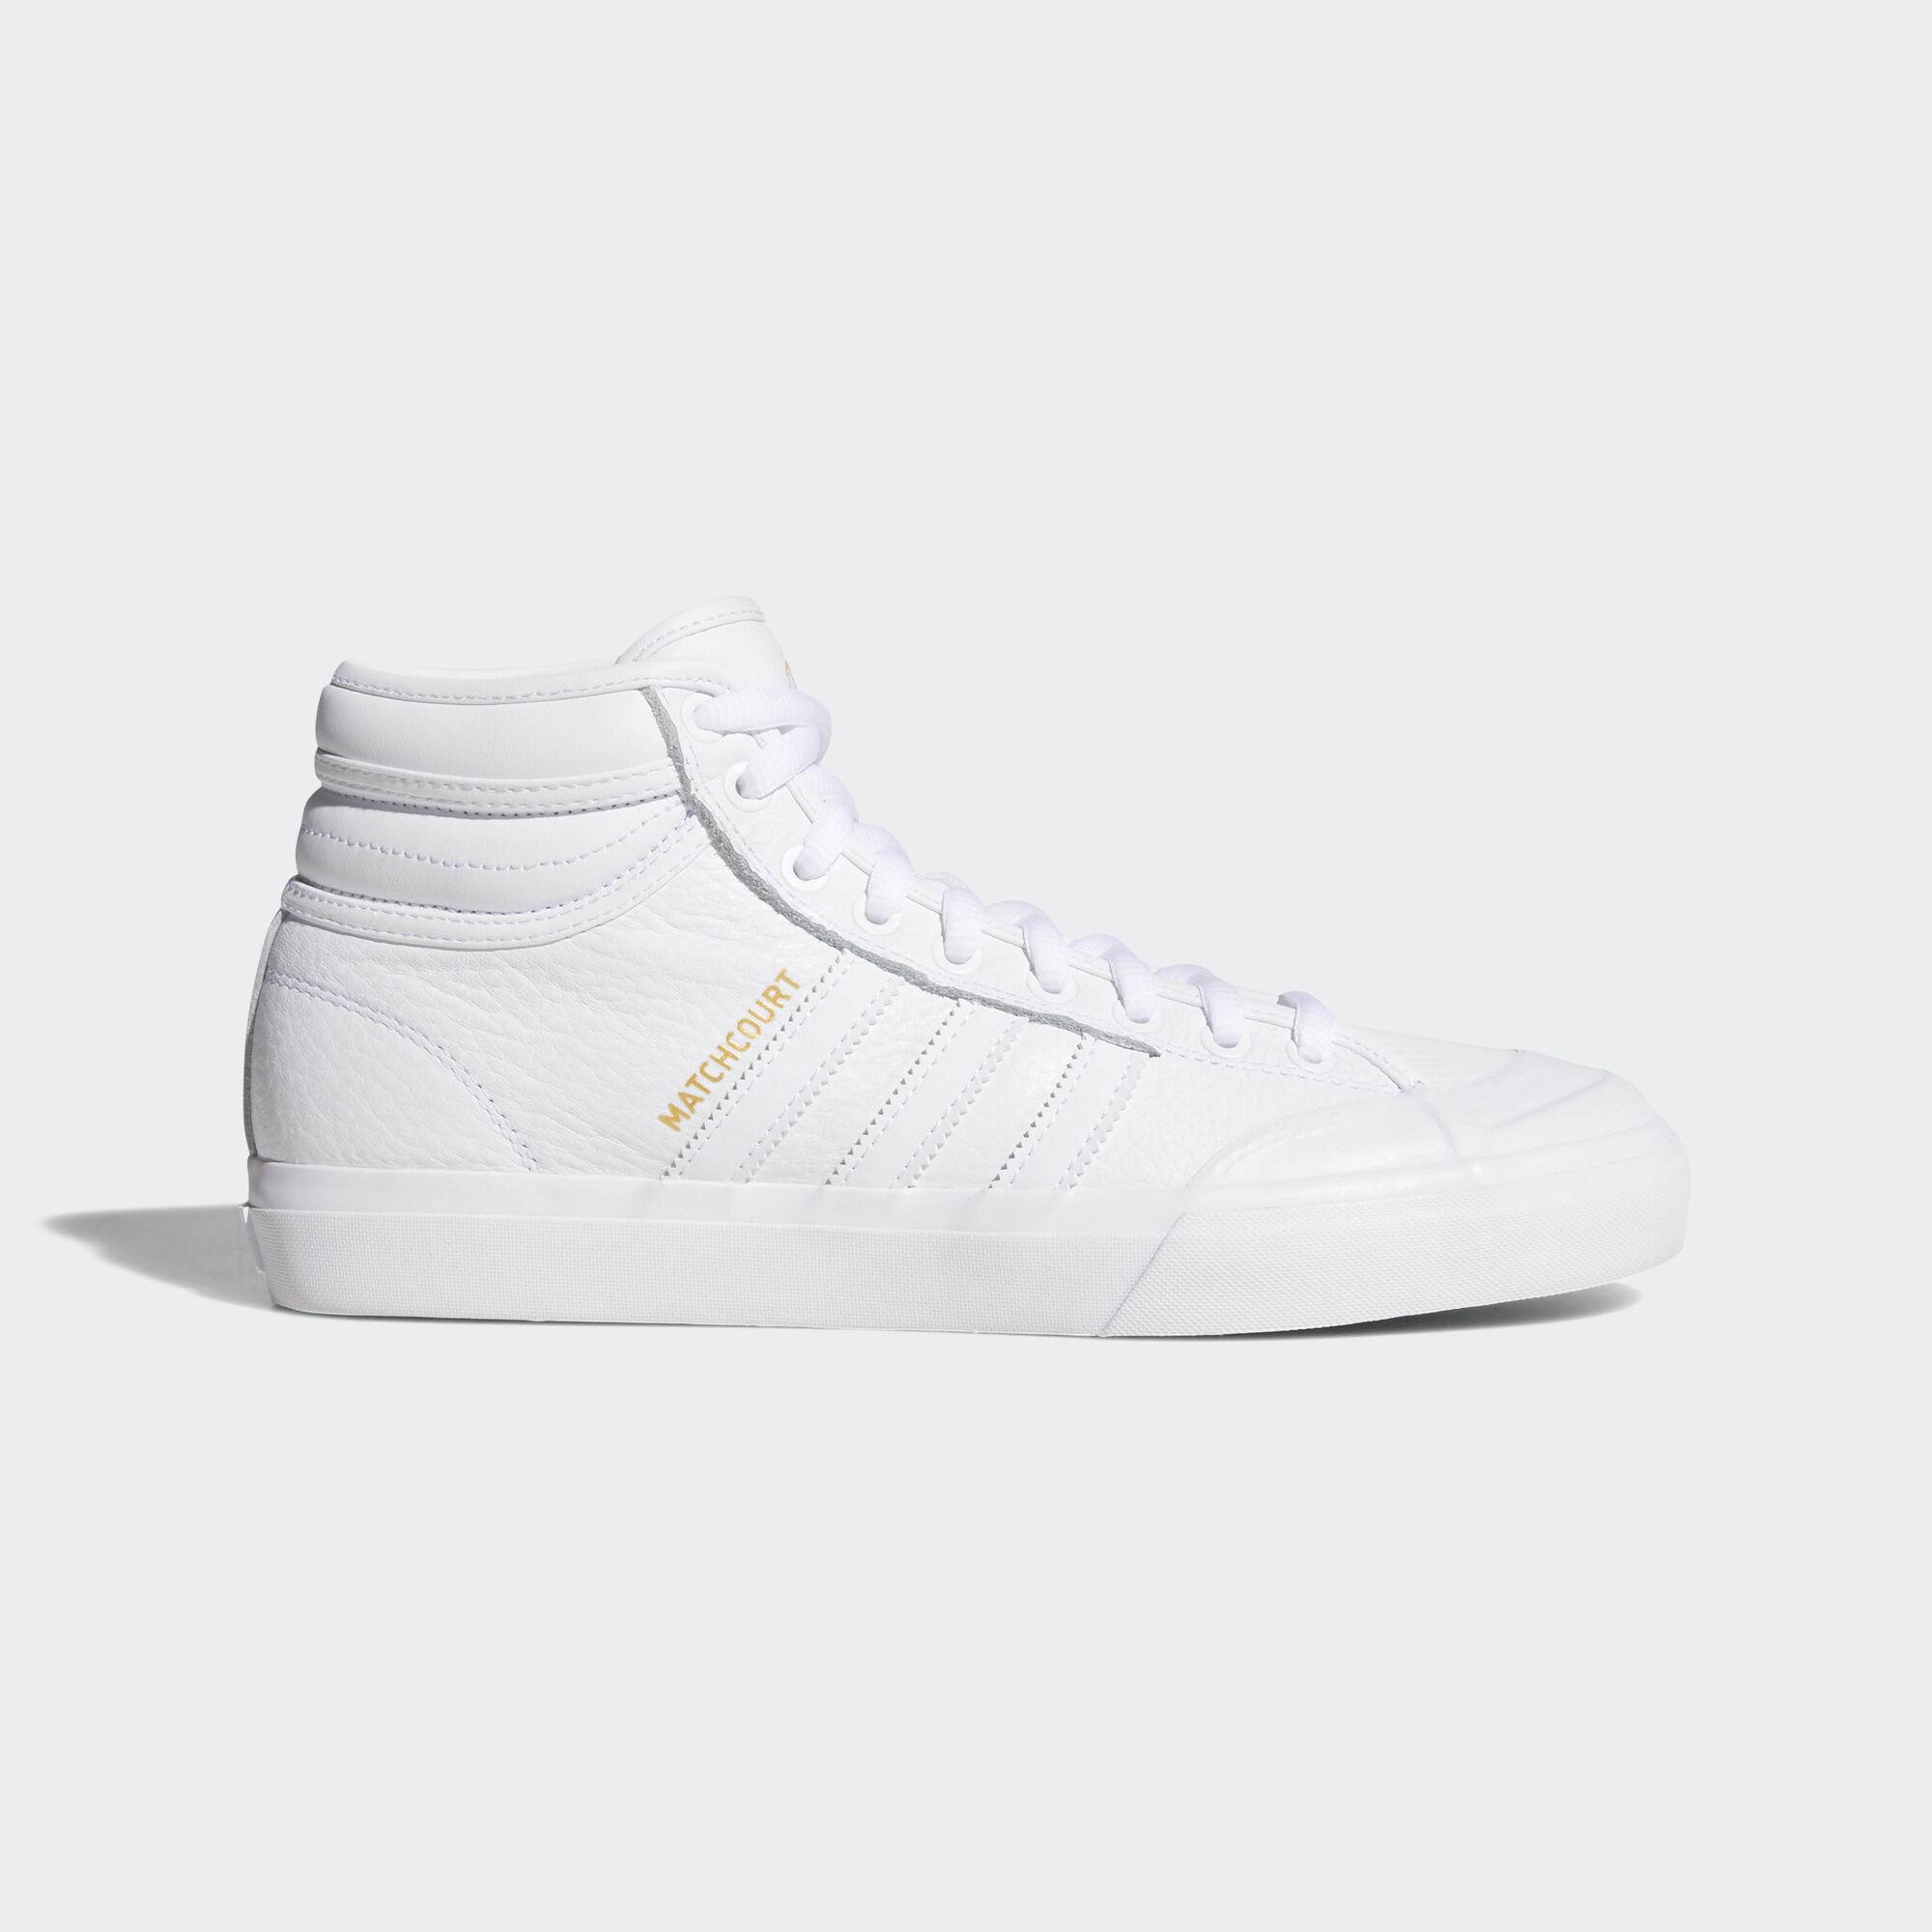 adidas Matchcourt High RX2 Shoes adidas White adidas Shoes Regional fb3be8